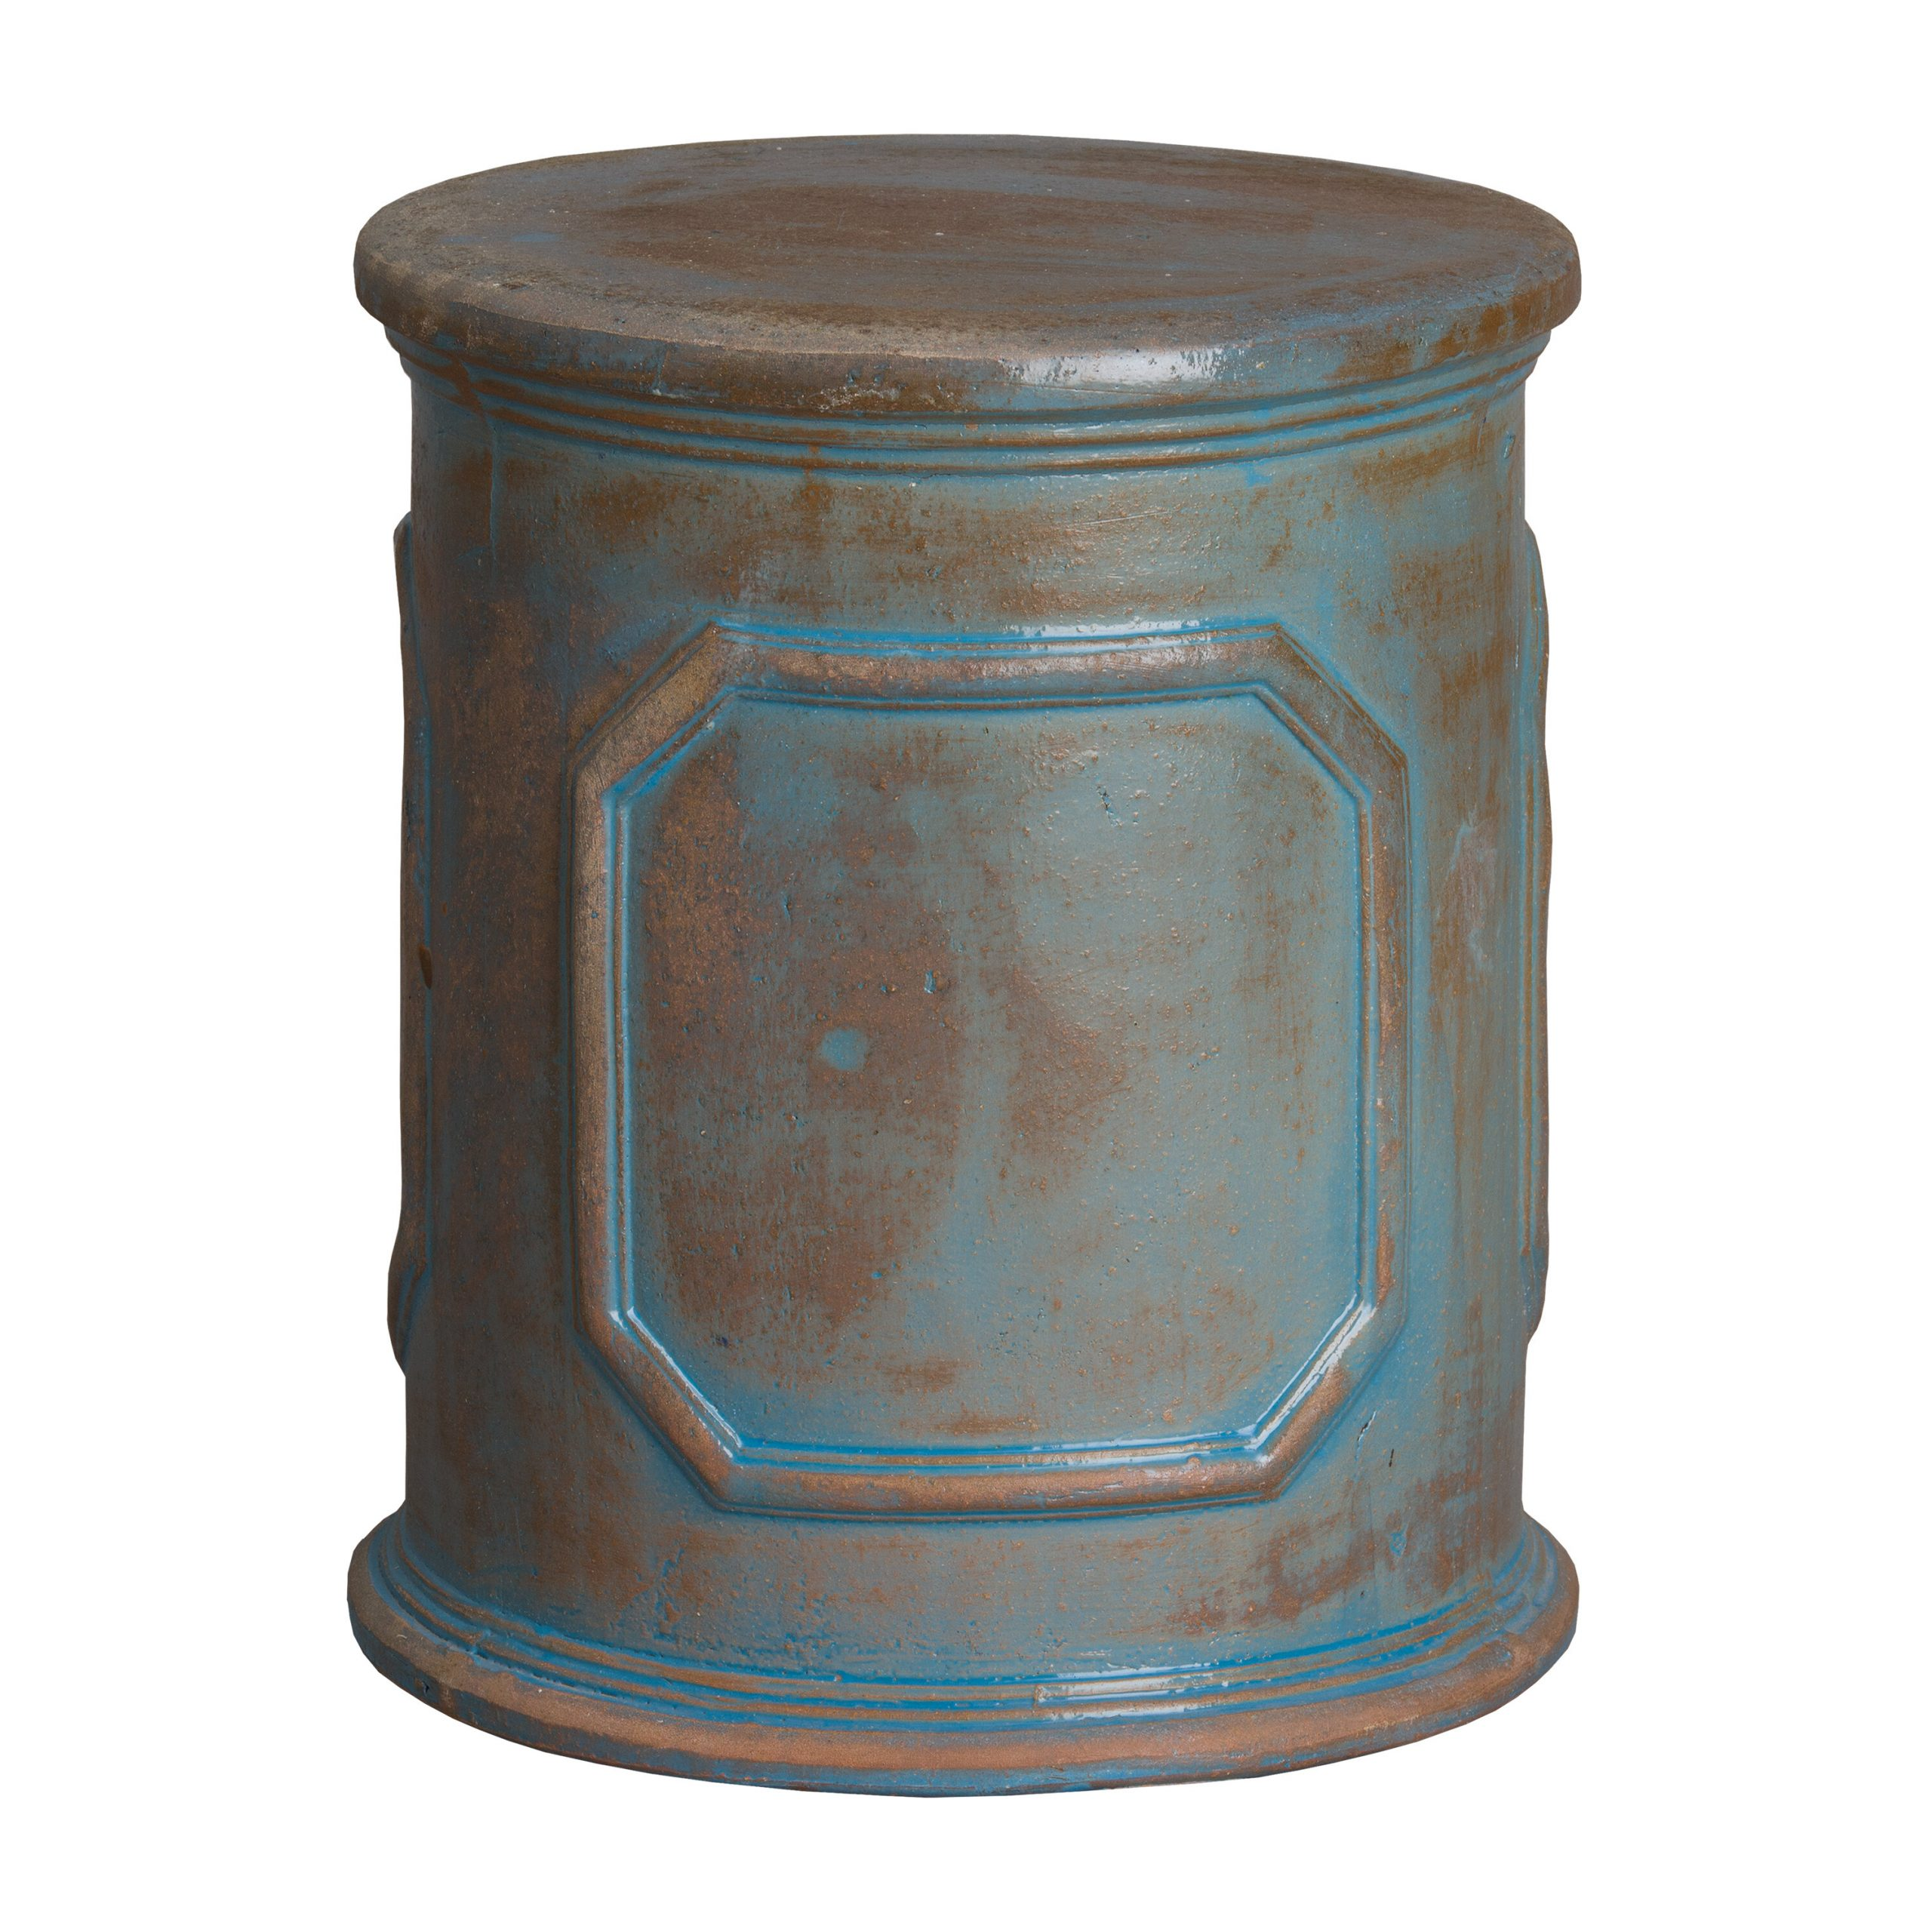 Penwortham Ceramic Garden Stool Inside Most Popular Engelhardt Ceramic Garden Stools (View 10 of 30)